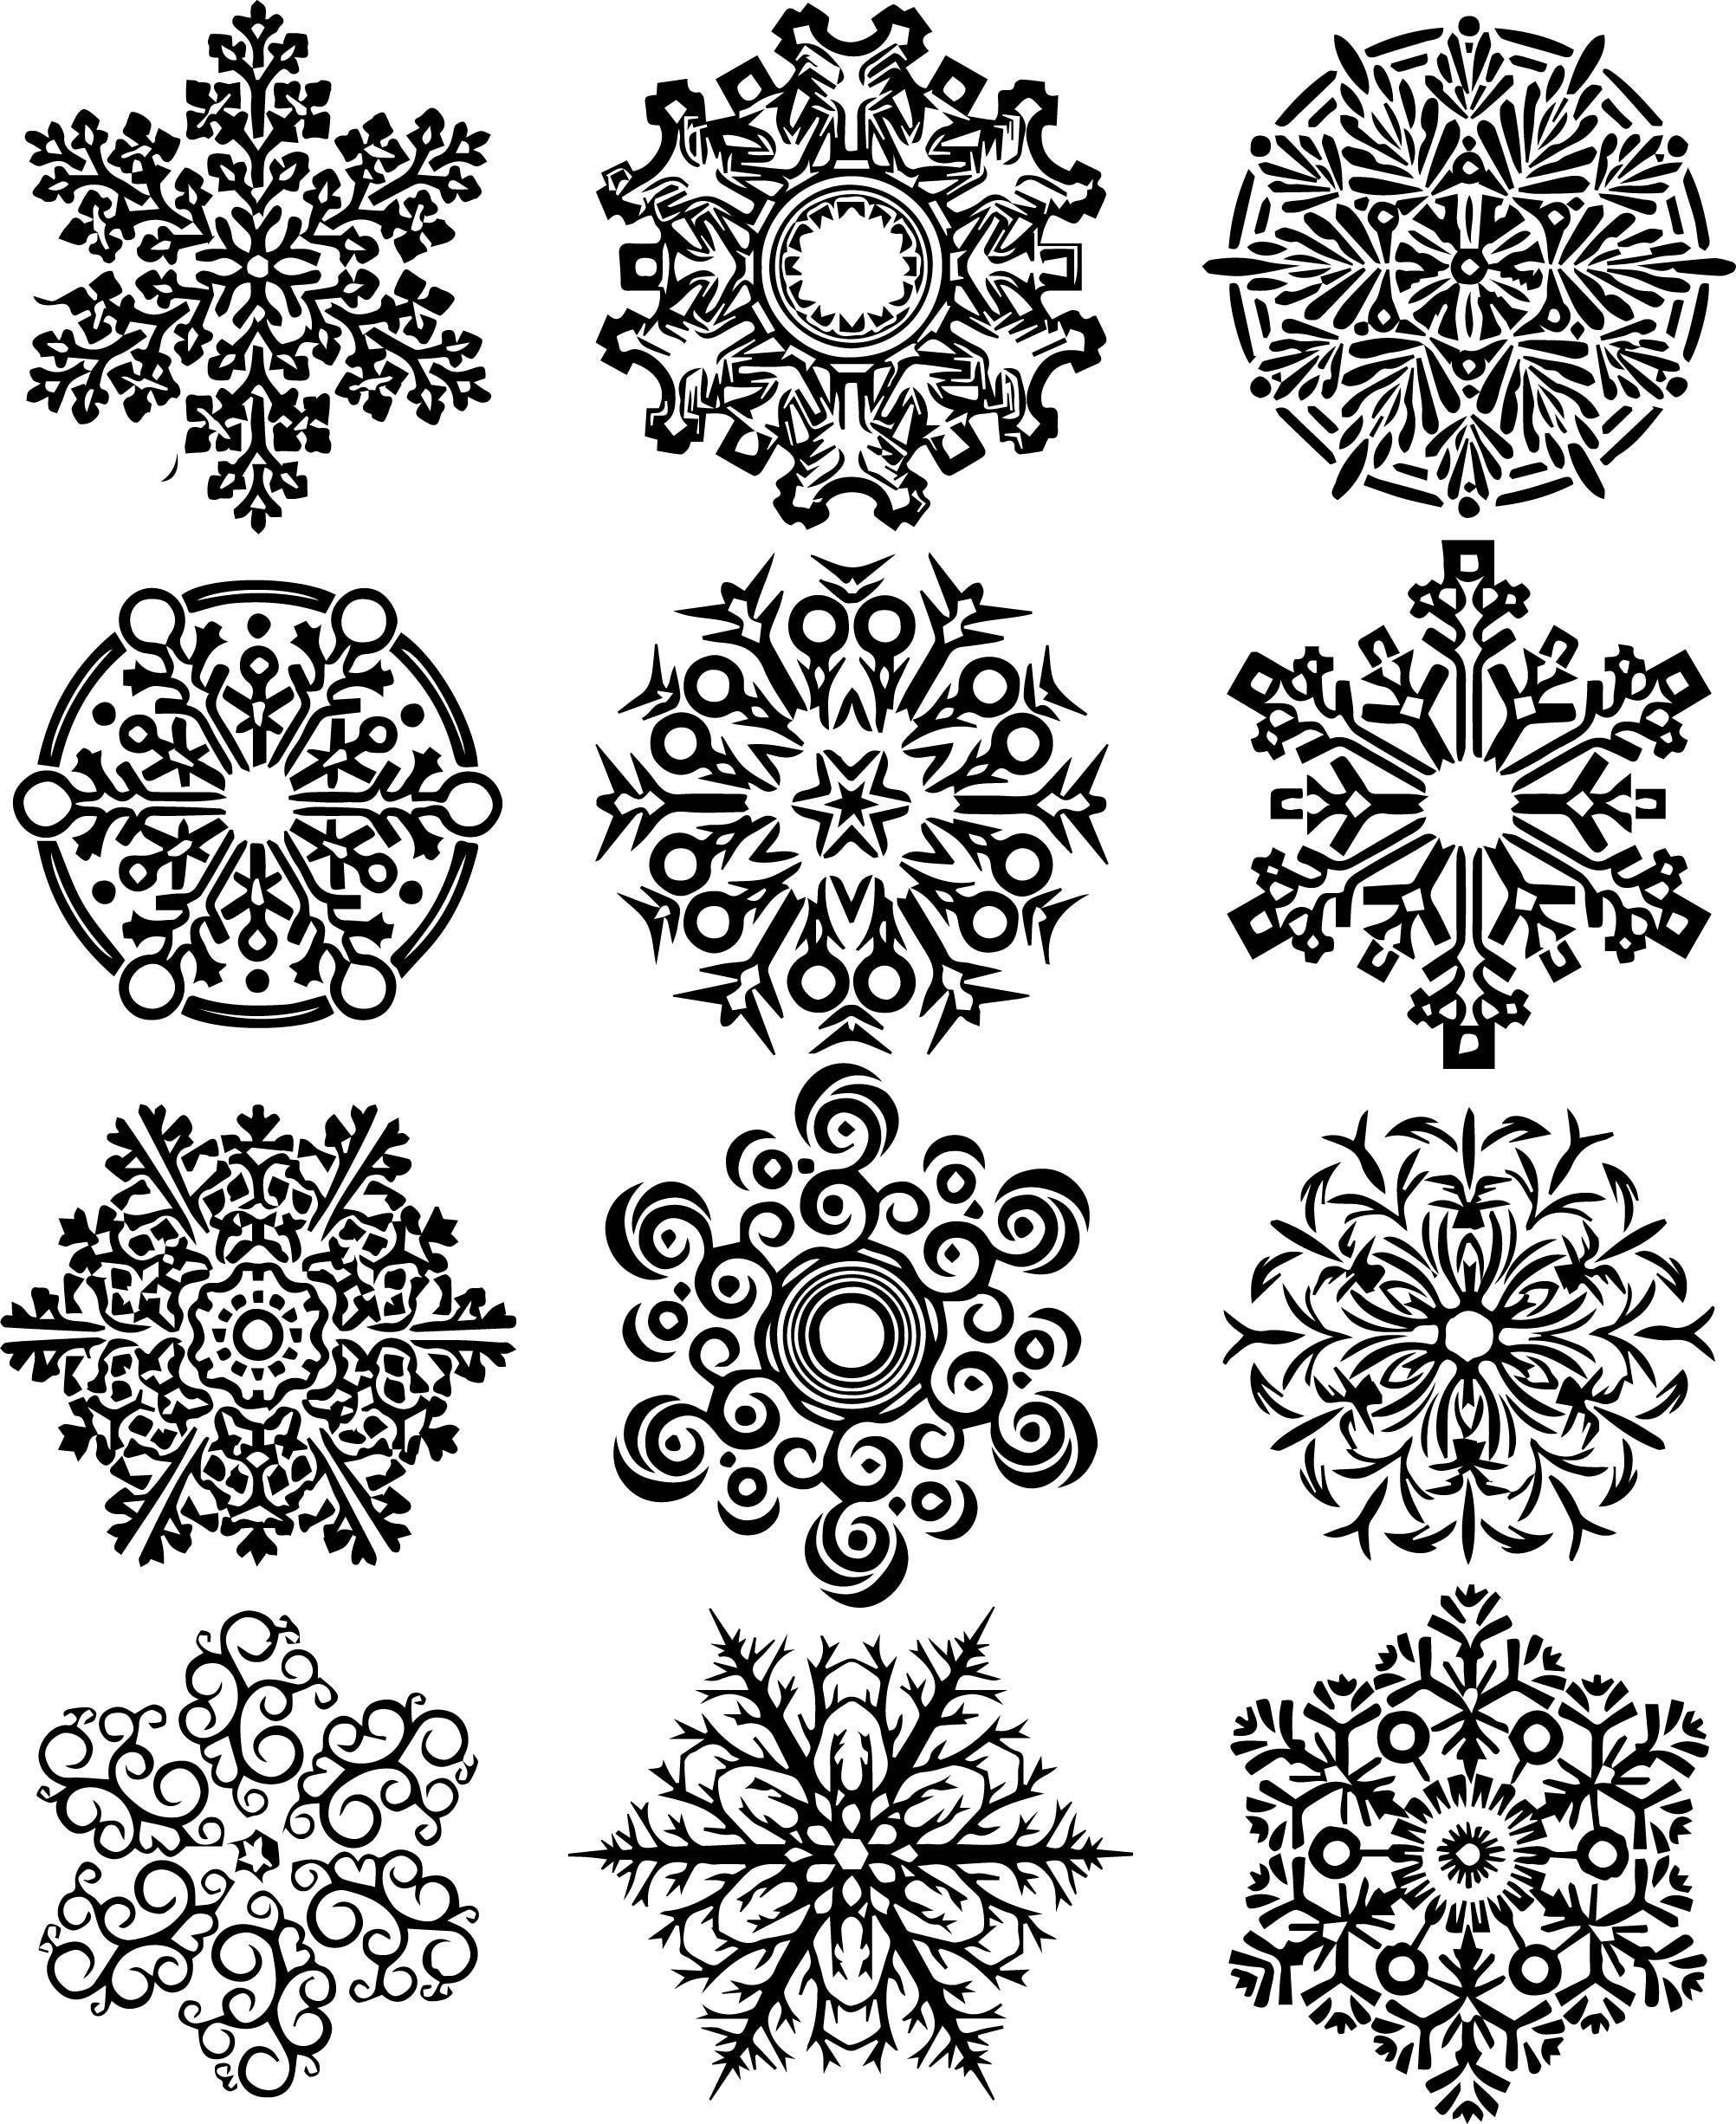 Twelve Fantastic Snowflake Coloring Page | Wecoloringpage.com